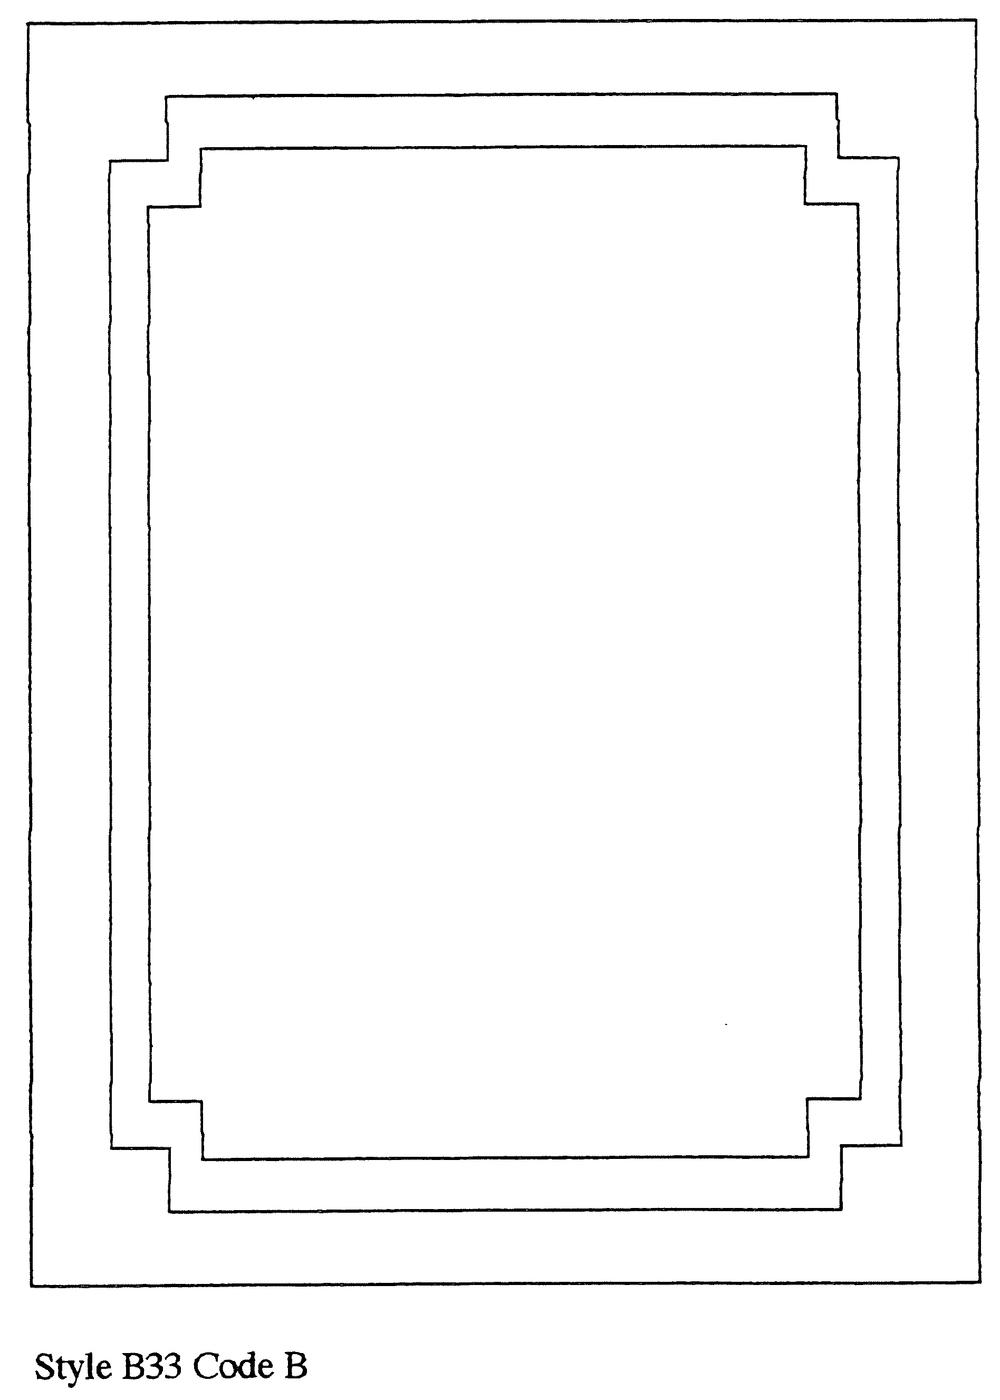 P1-B33.jpg